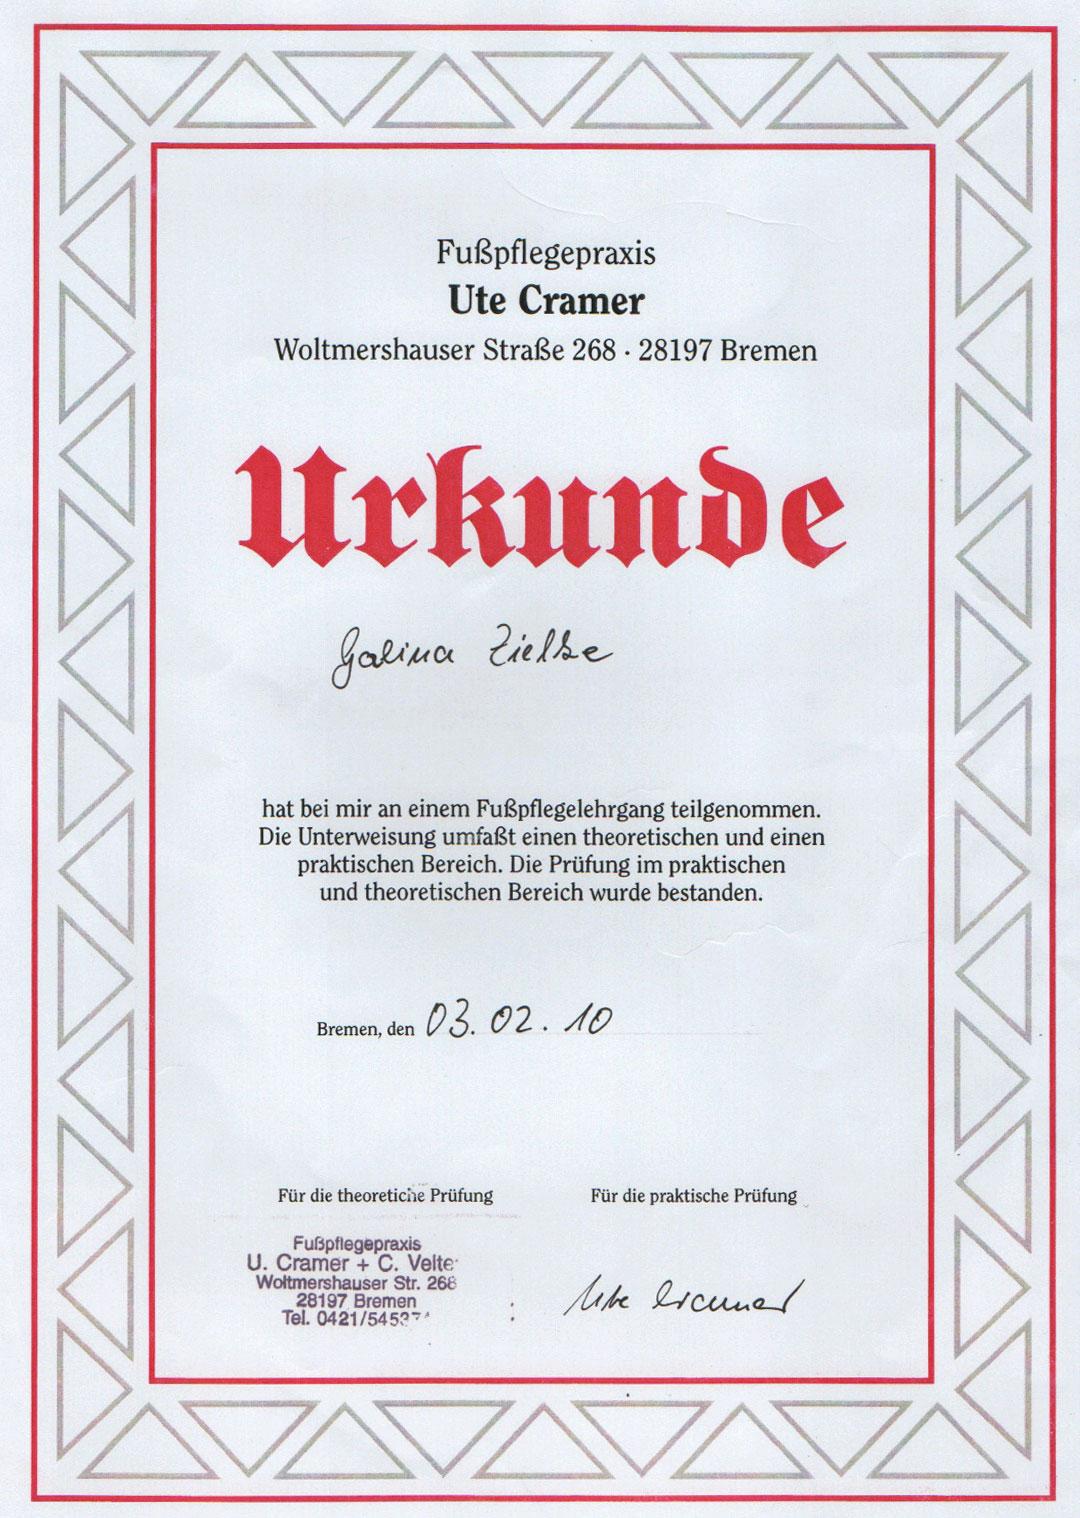 Galina Zielke - Mobile Fußpflege Urkunde